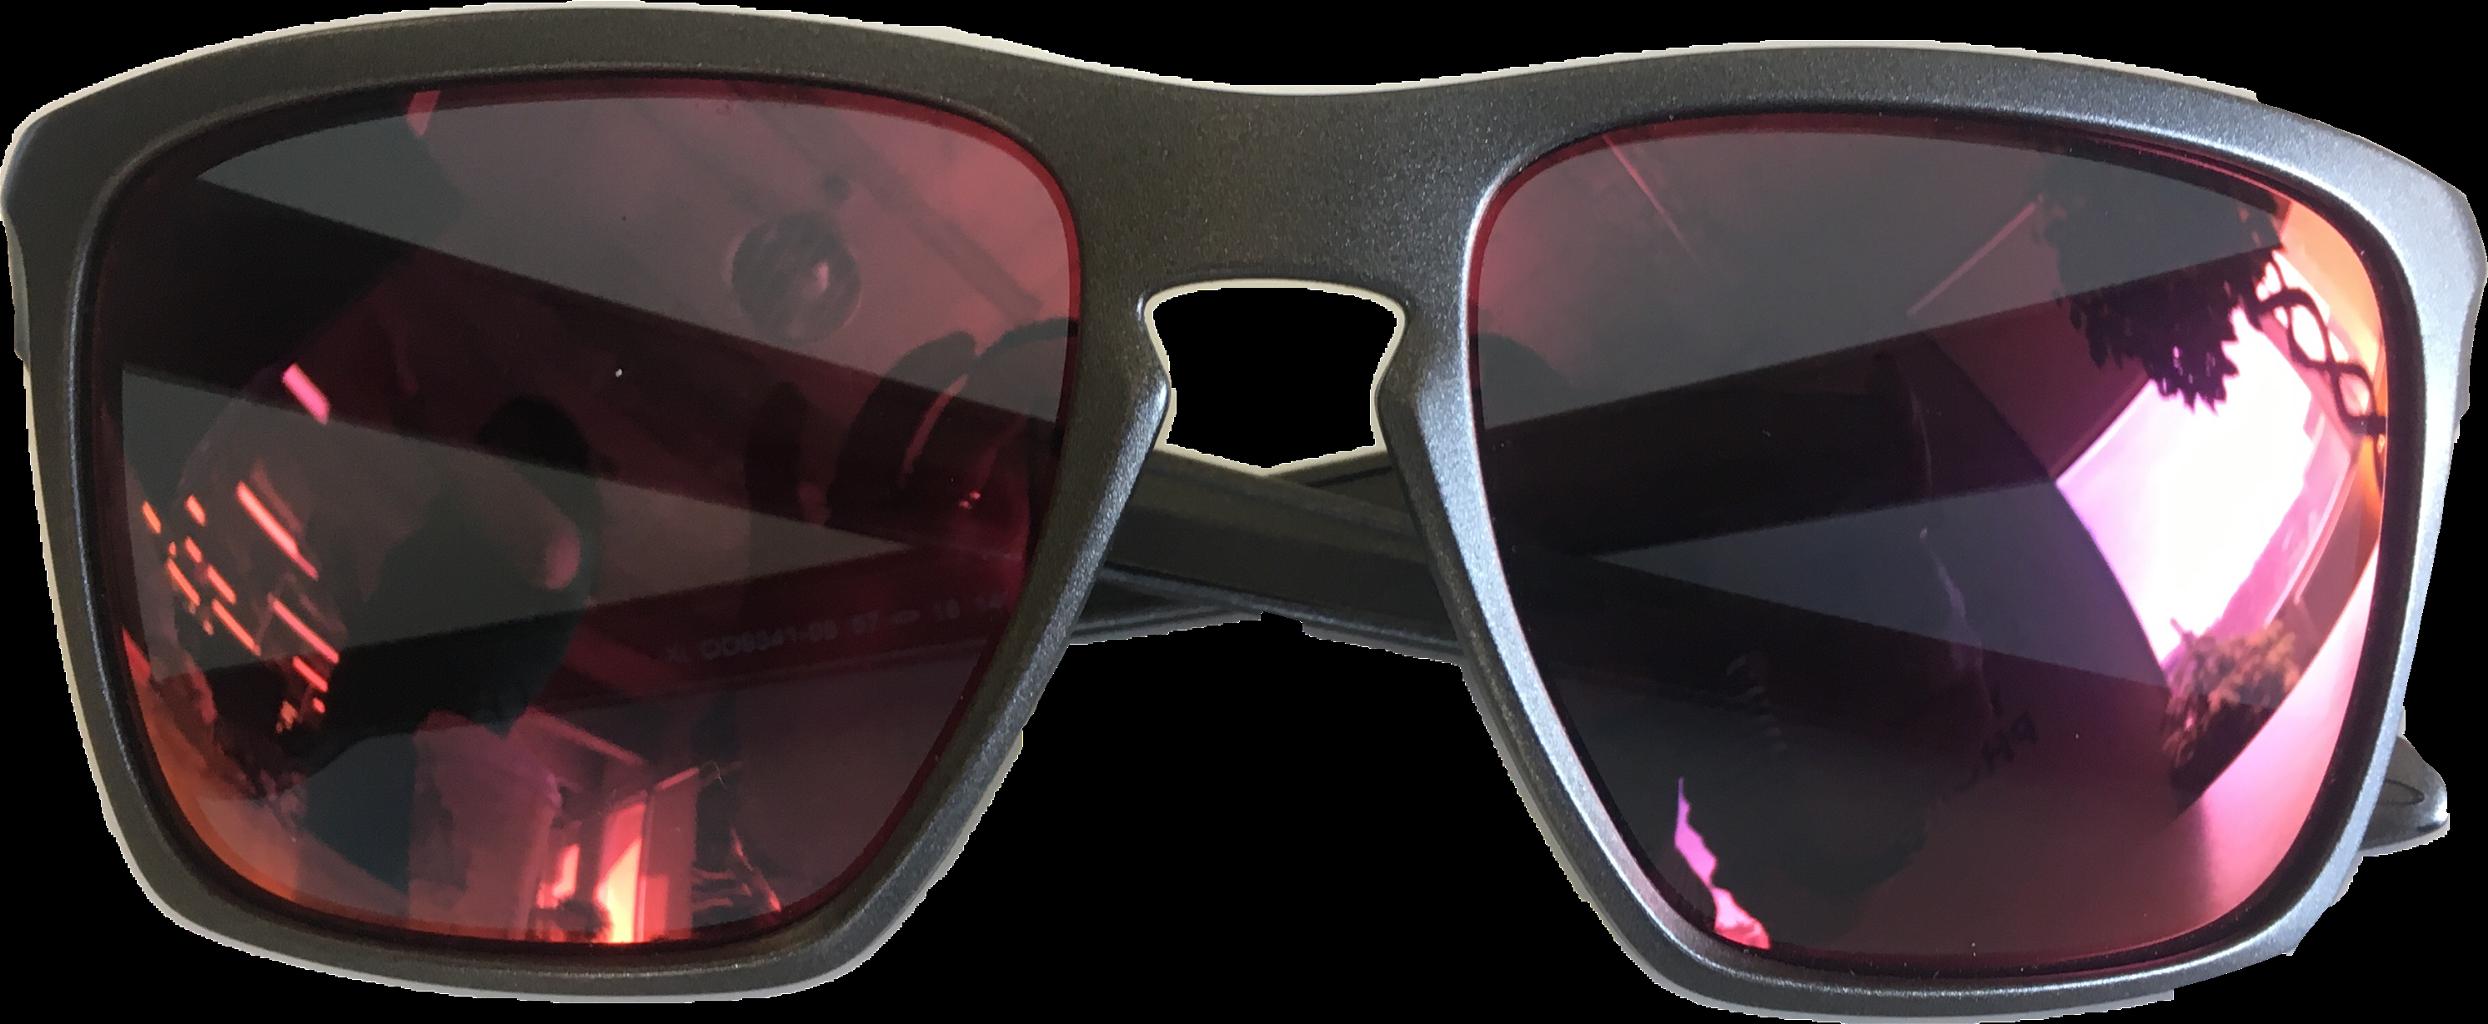 Stylish goggles clipart clip art black and white Goggles clipart stylish, Goggles stylish Transparent FREE ... clip art black and white